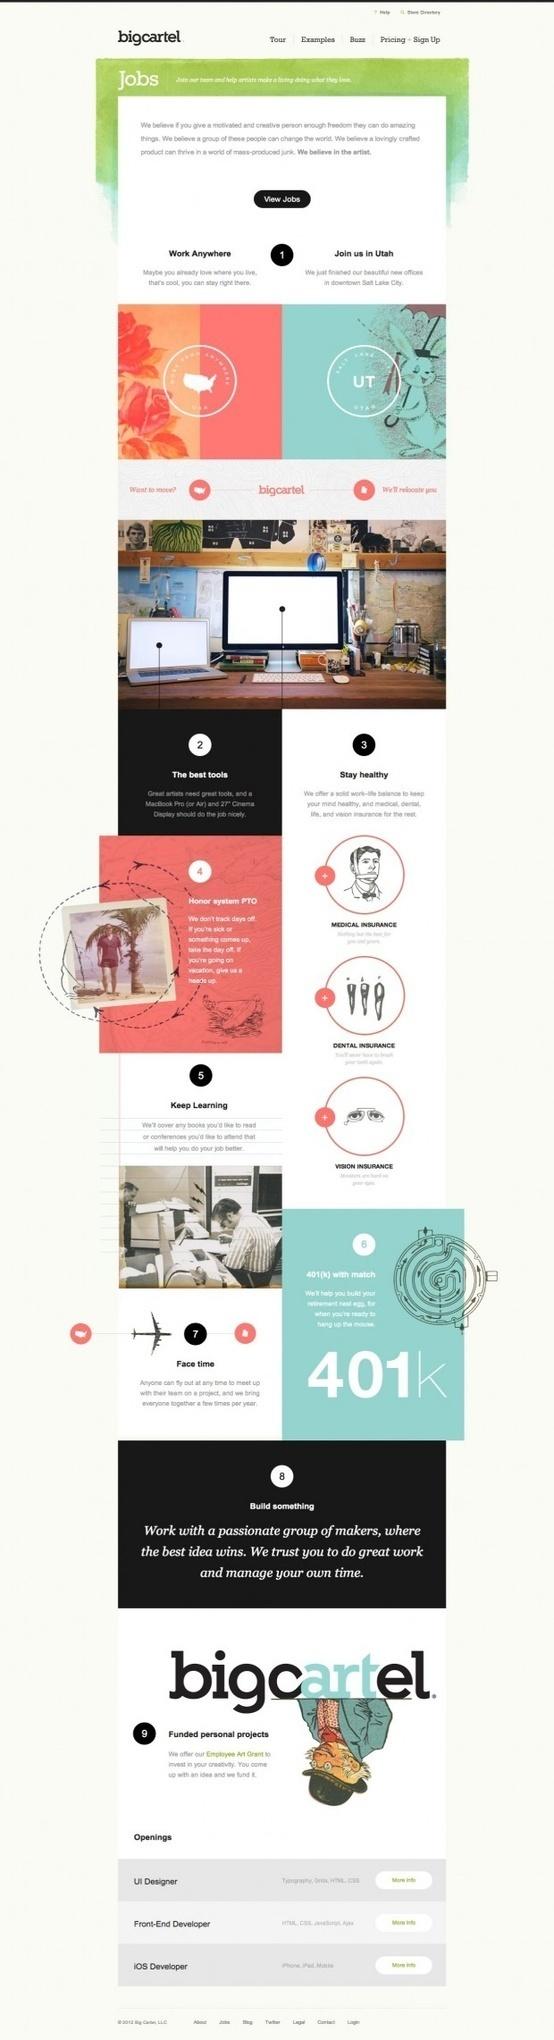 bigcartel web design #block #design #web #color